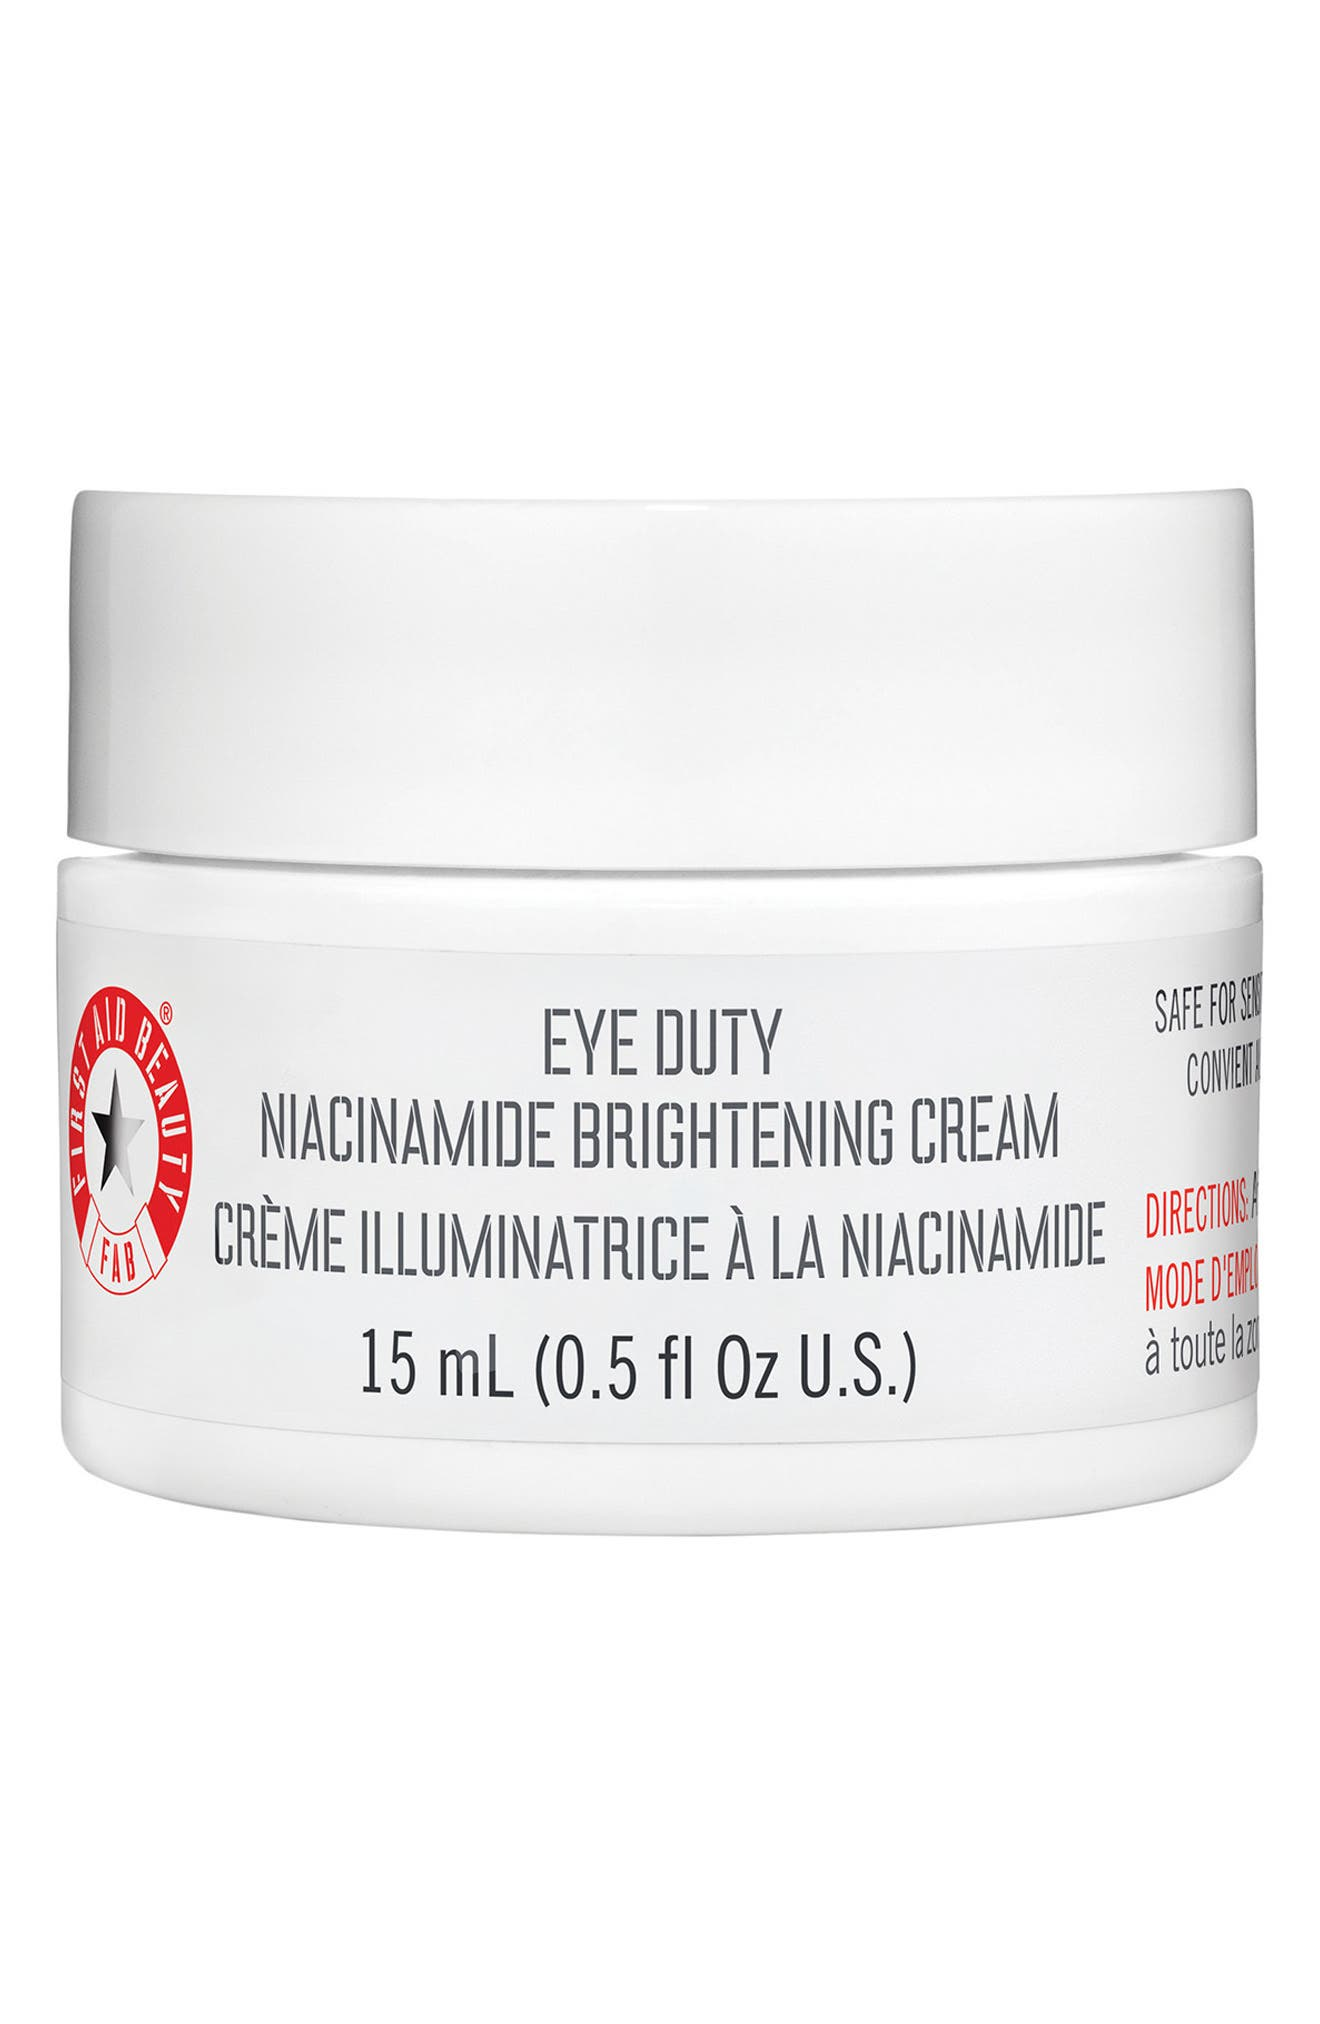 Eye Duty Niacinamide Brightening Cream